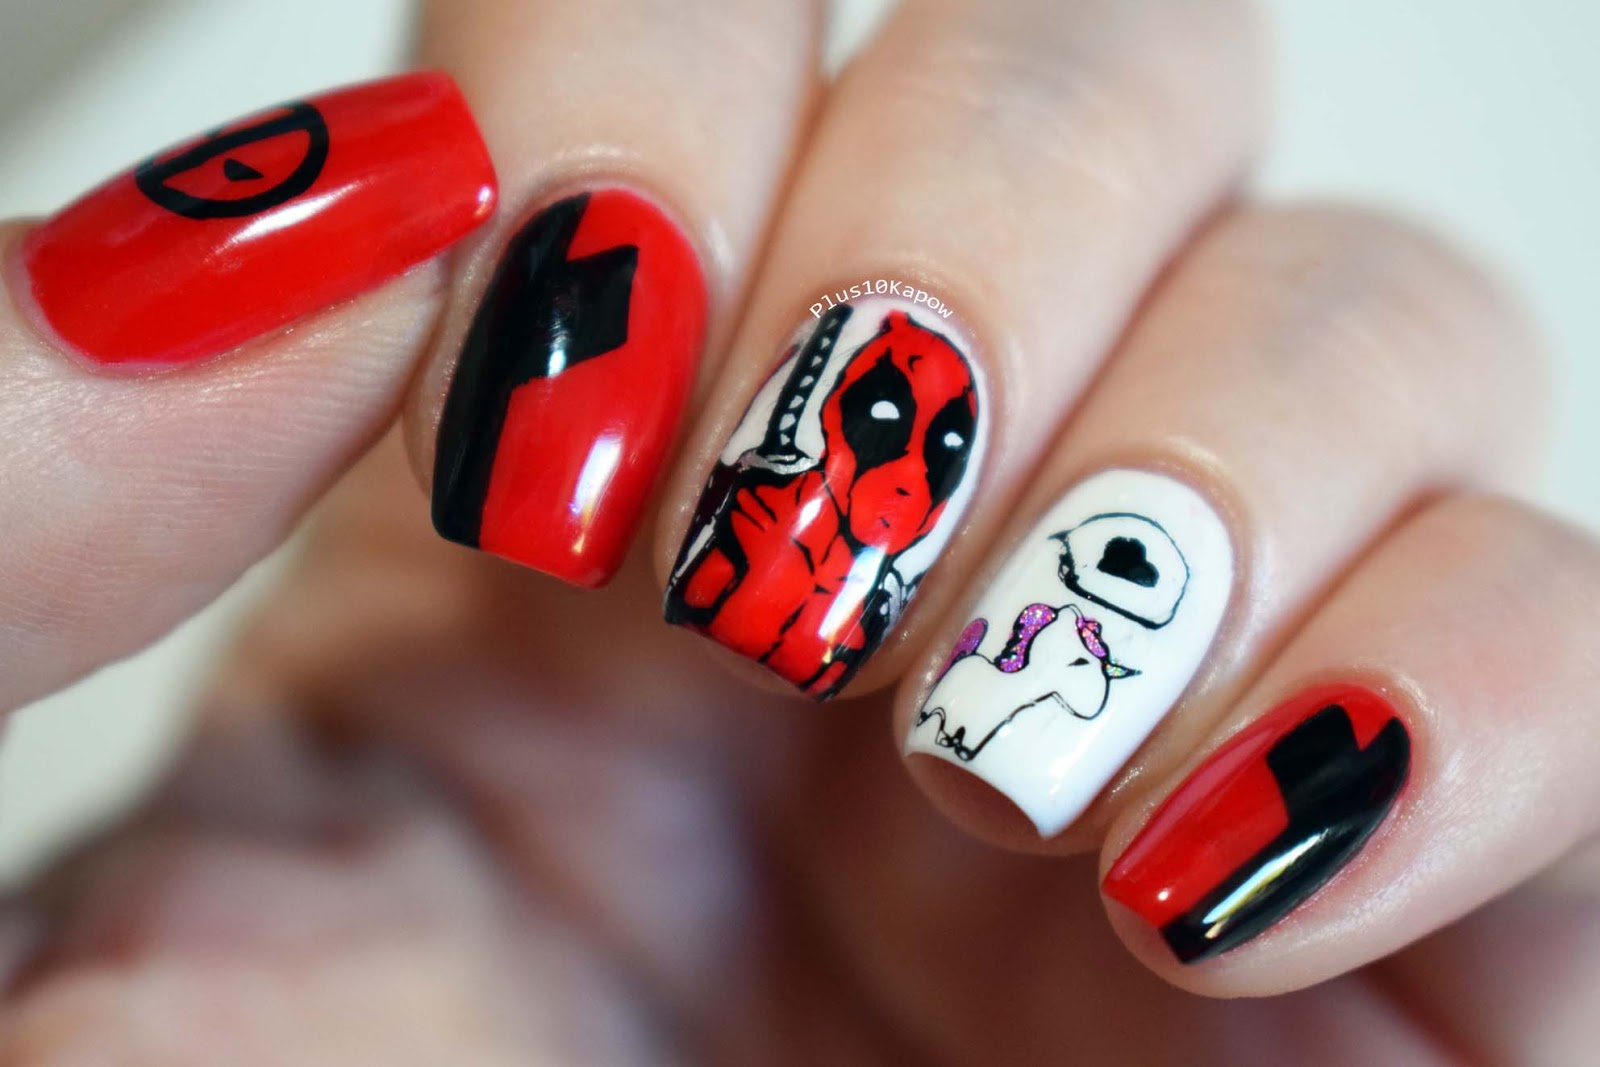 Nail Art Ideas » Deadpool Nail Art - Pictures of Nail Art Design Ideas